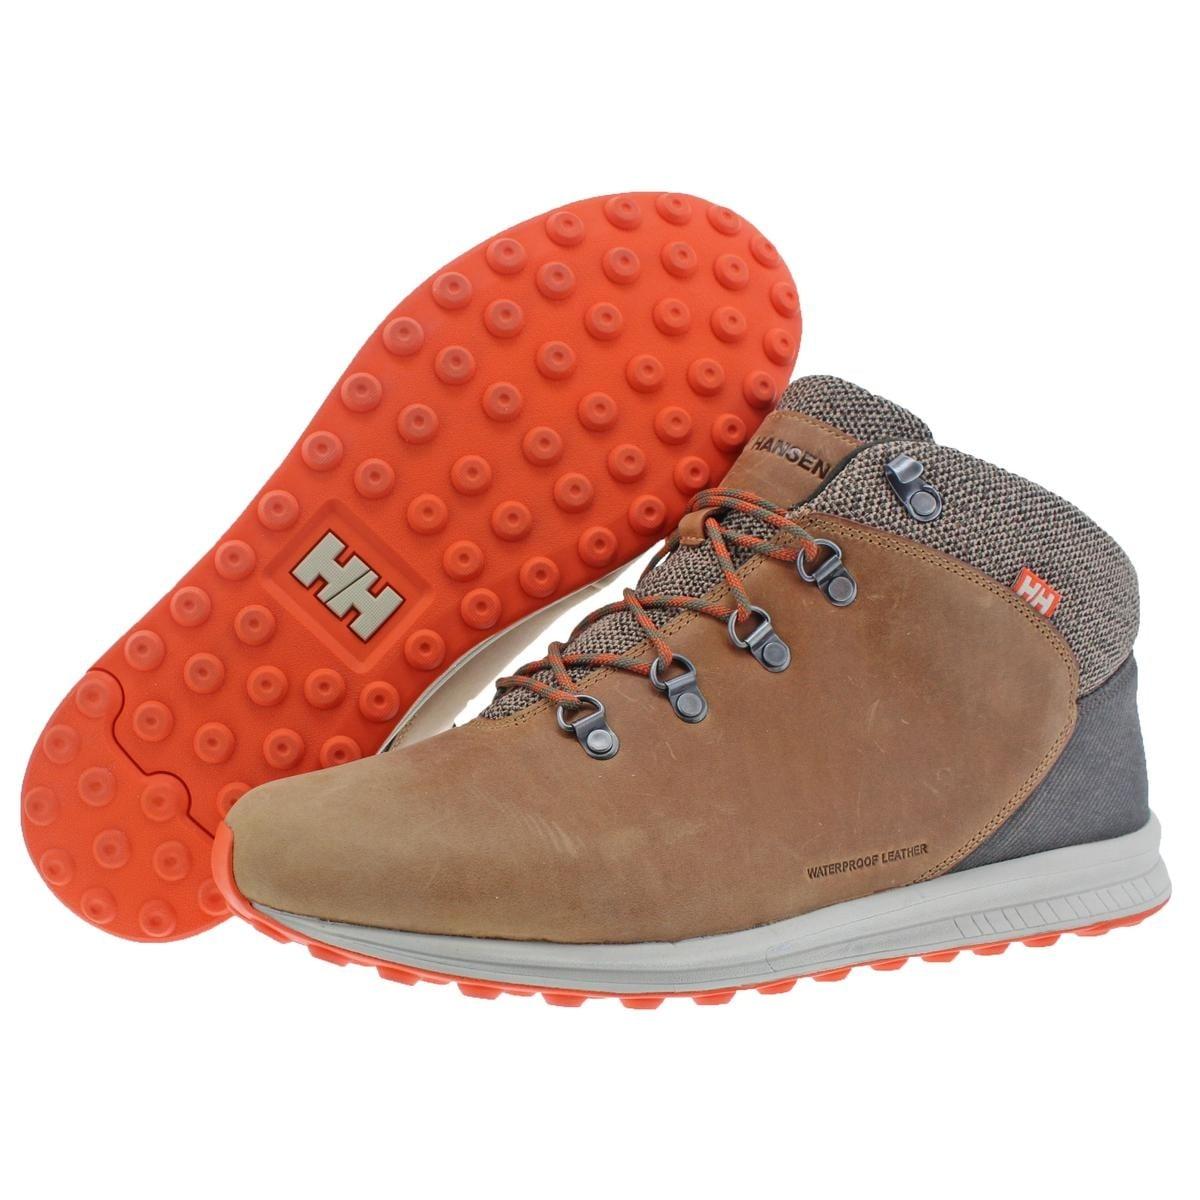 b230637b194 Helly Hansen Mens Jaythen X Winter Boots Leather Waterproof